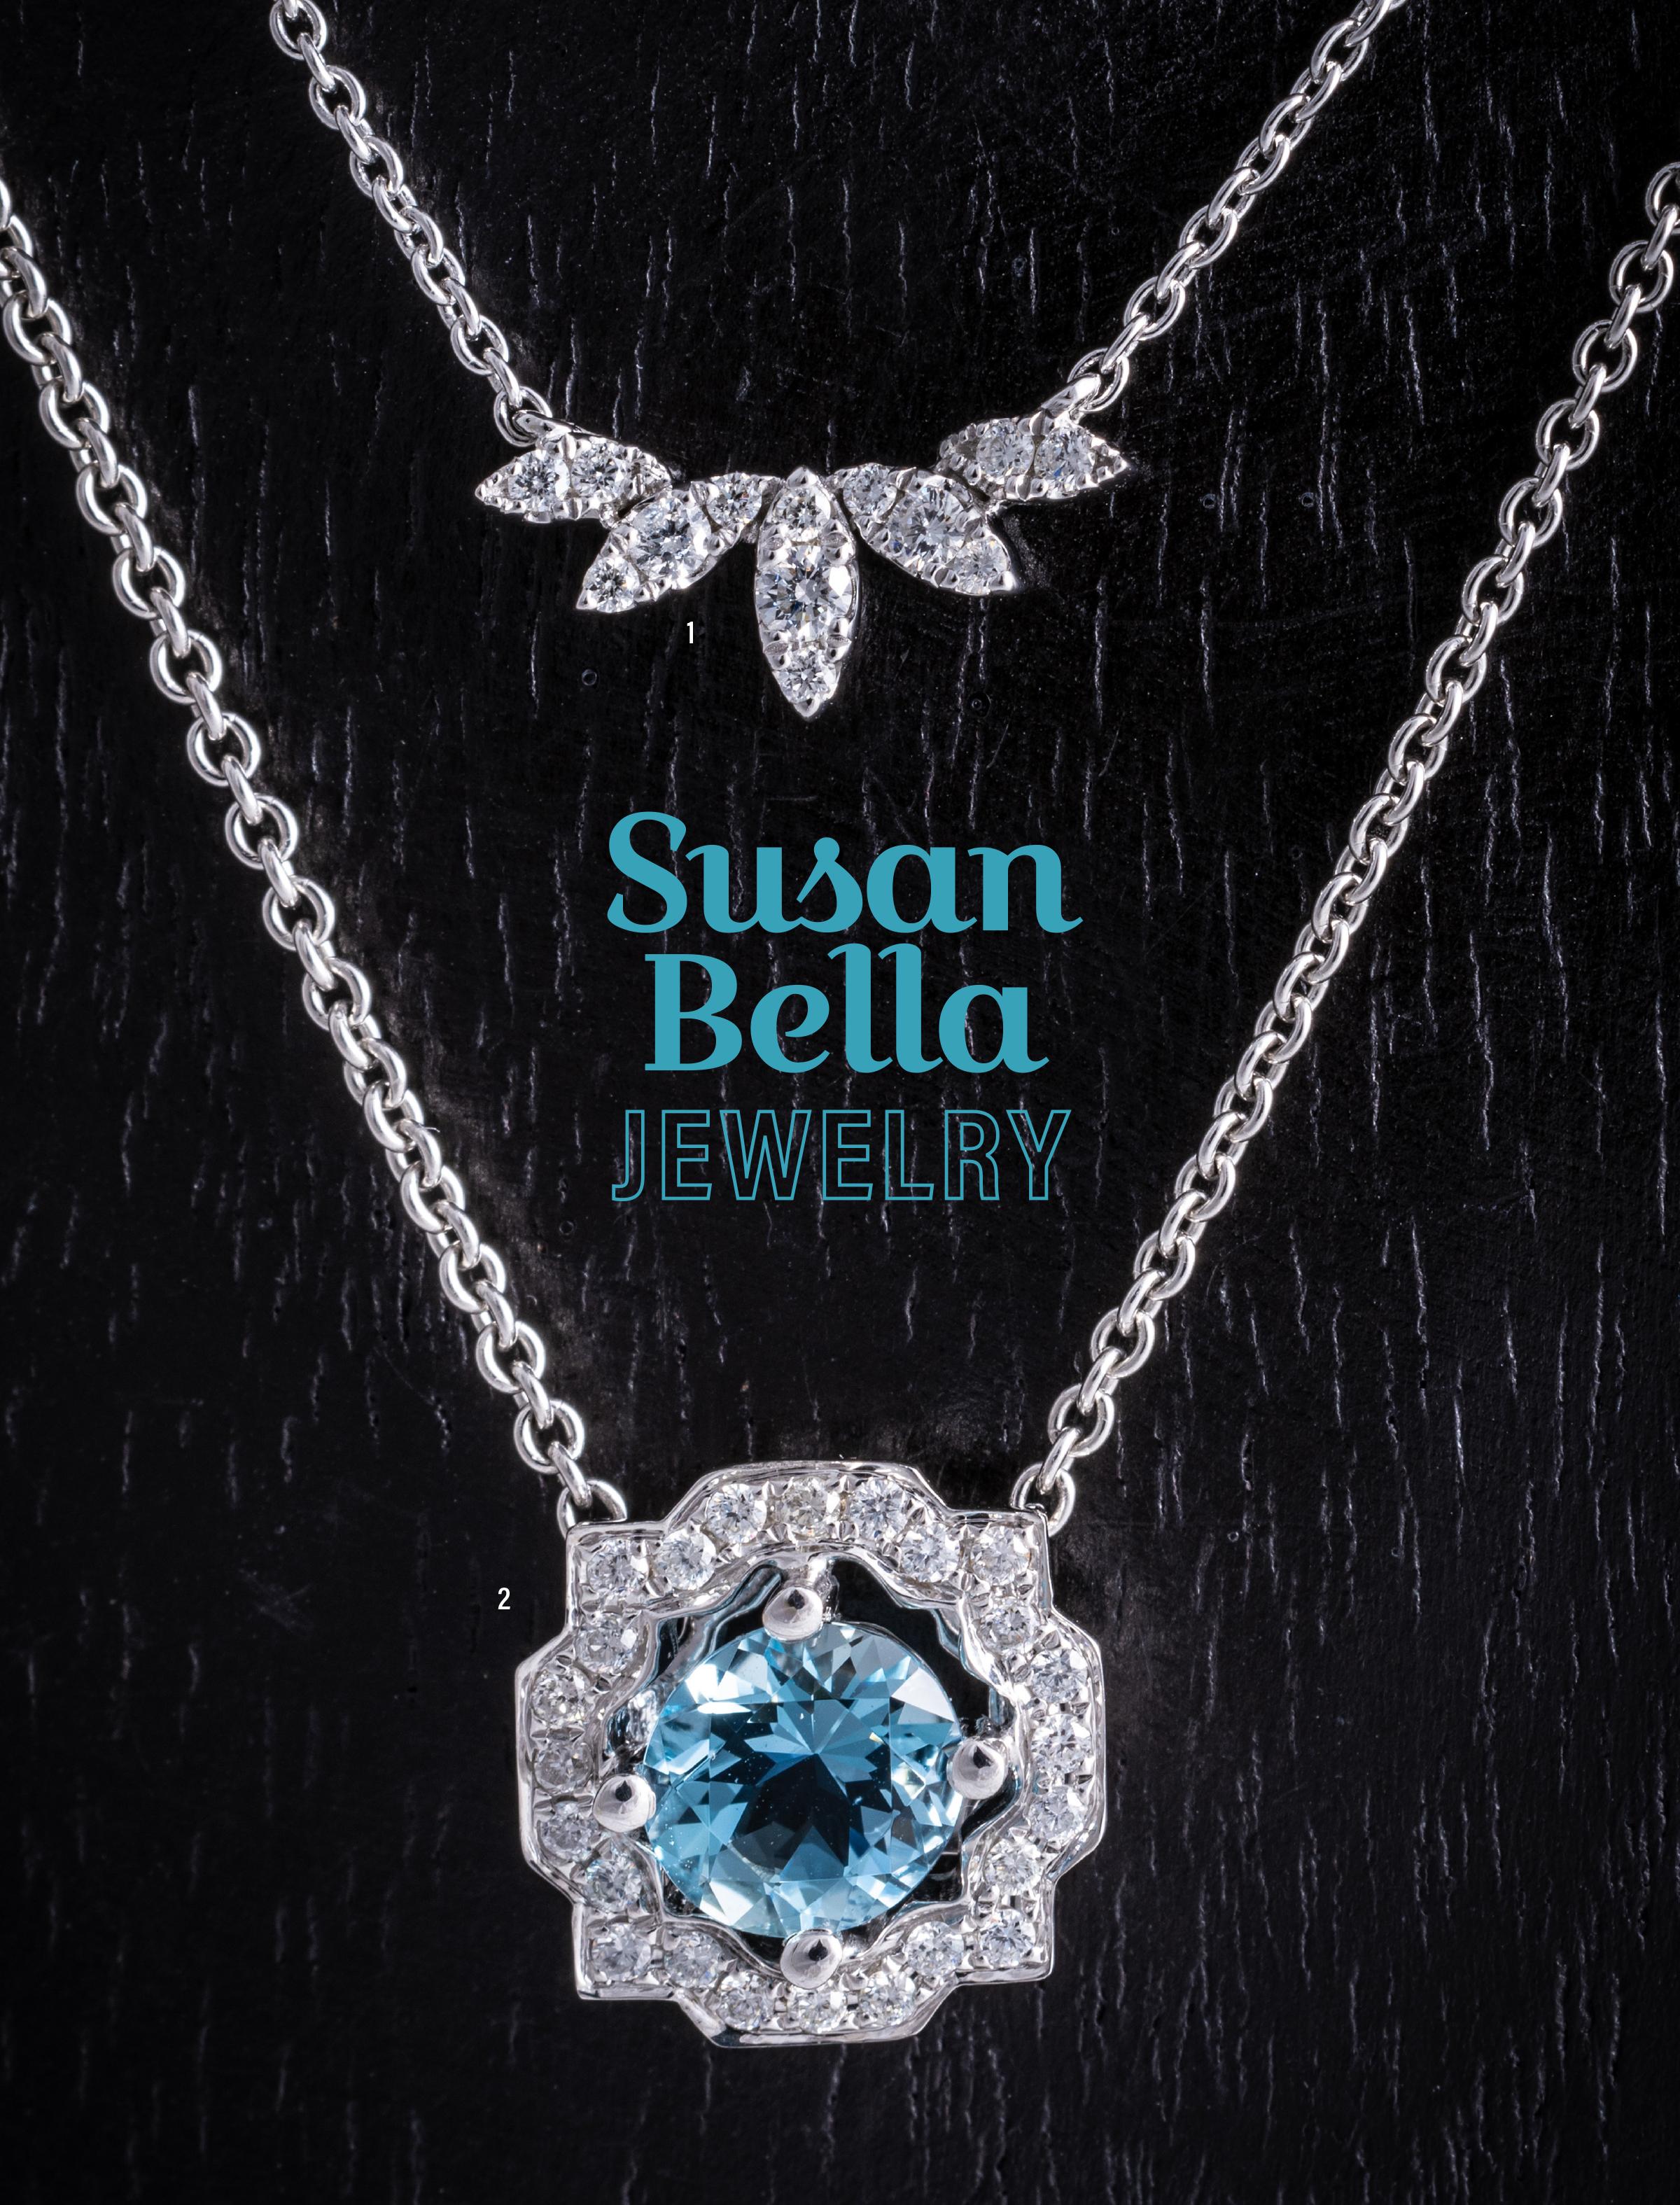 Susan Bella Jewelry image